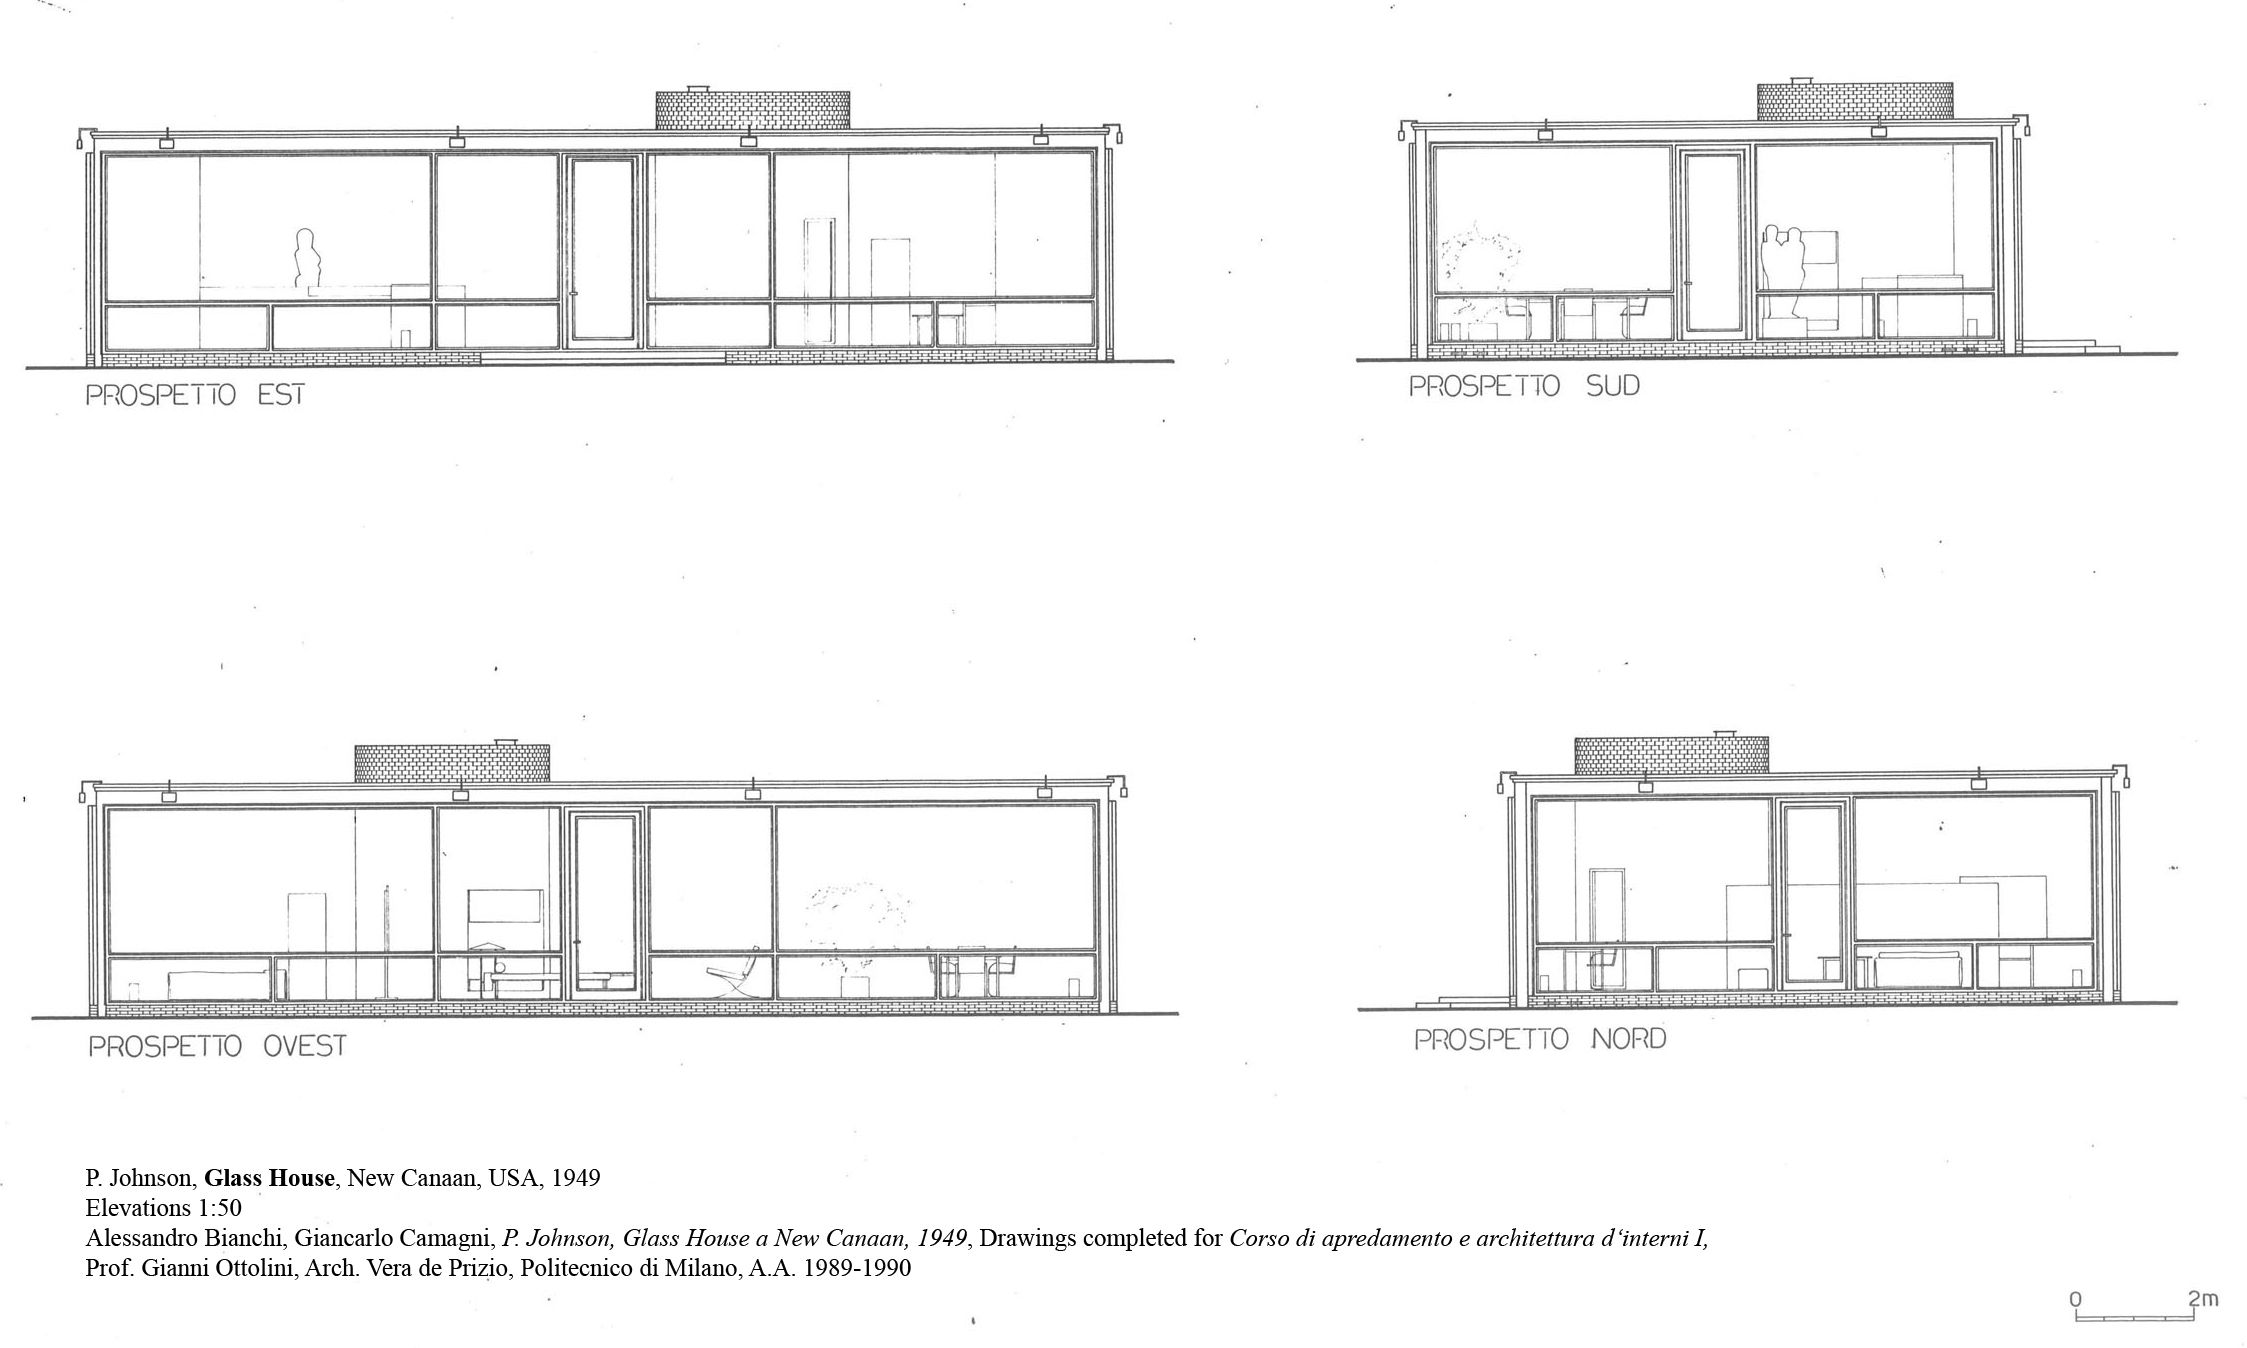 glass house philip johnson plan farnsworth dimensions home